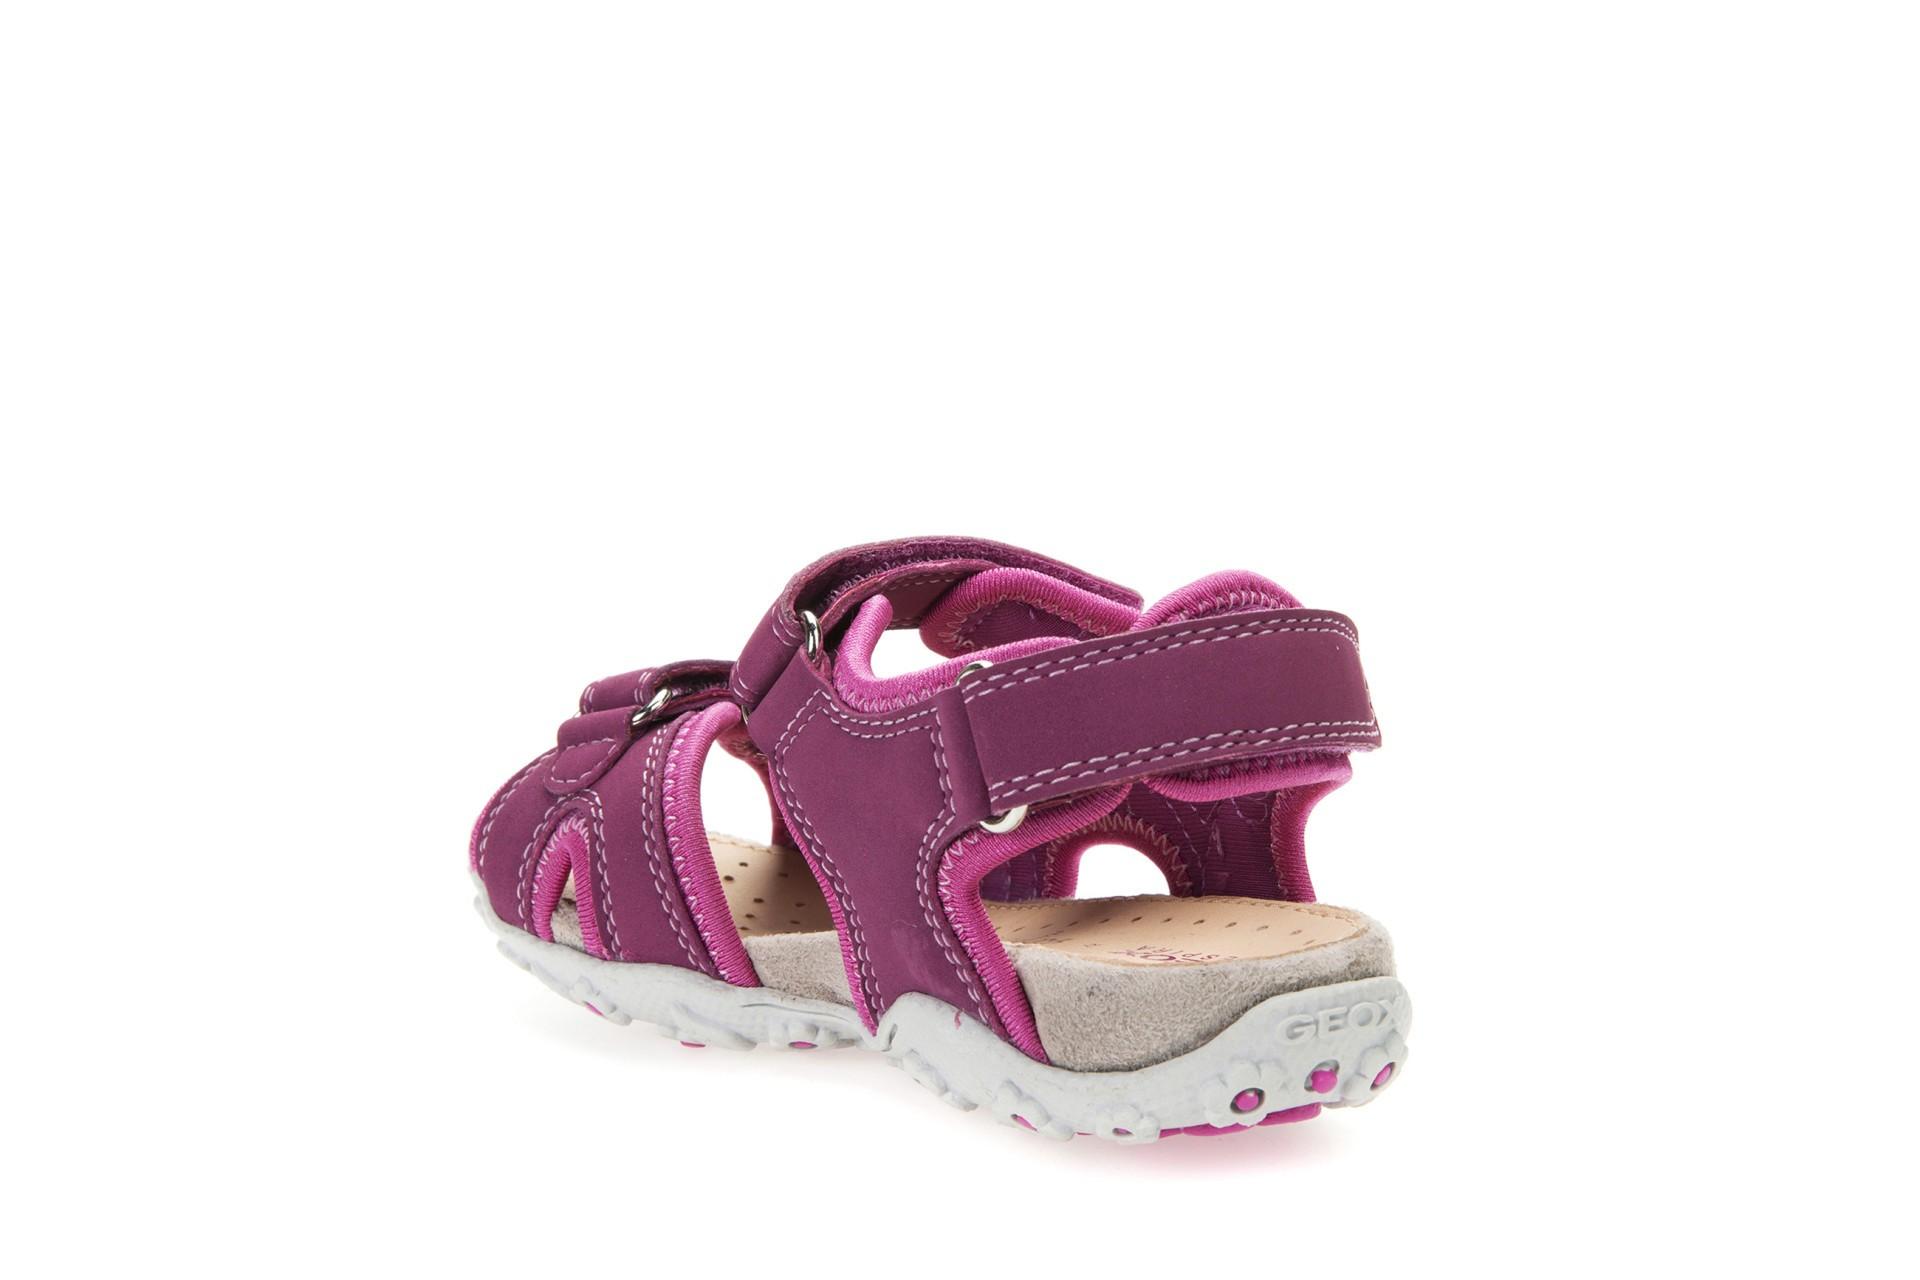 Geox Roxanne Fuchsia Sandals Geox Kids Shoes Little